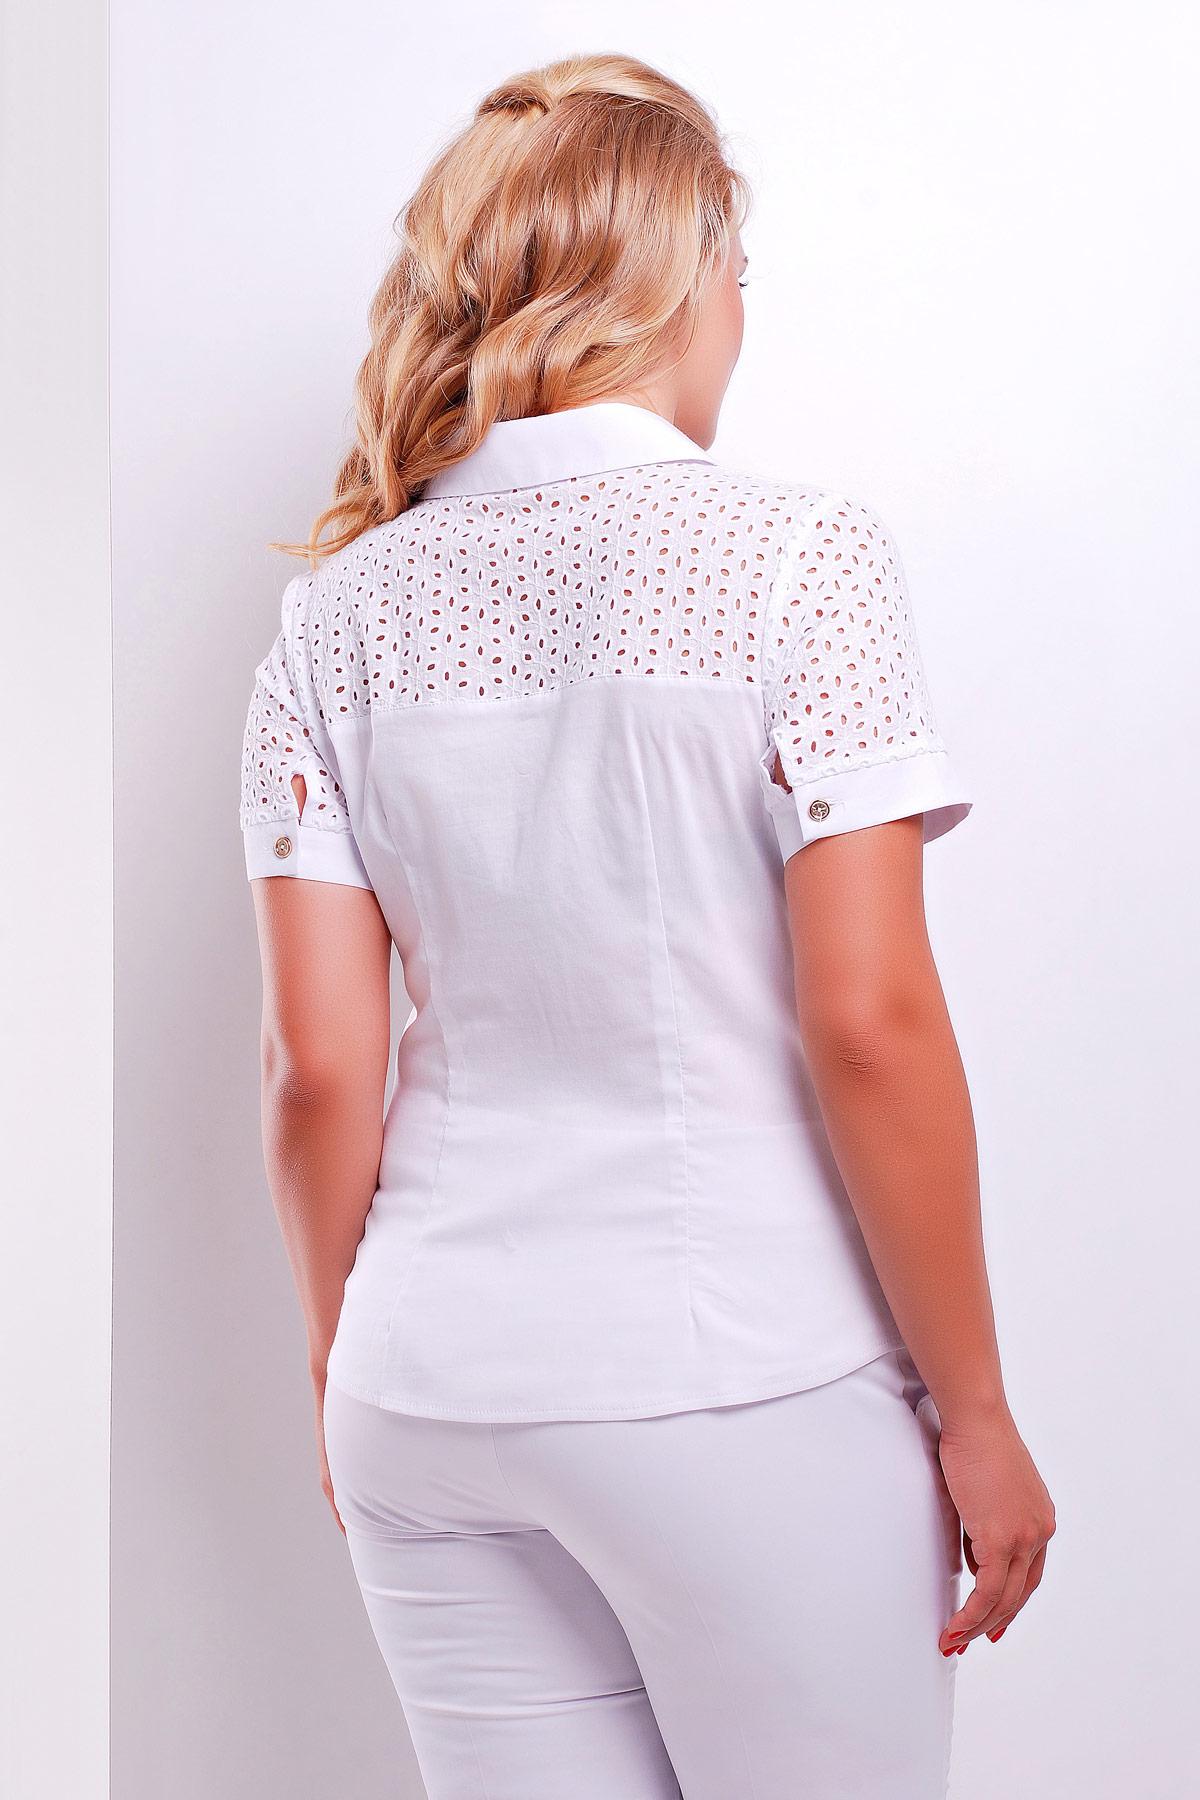 4a365f9216f женская блузка белая большого размера. блуза Фауста-Б к р.